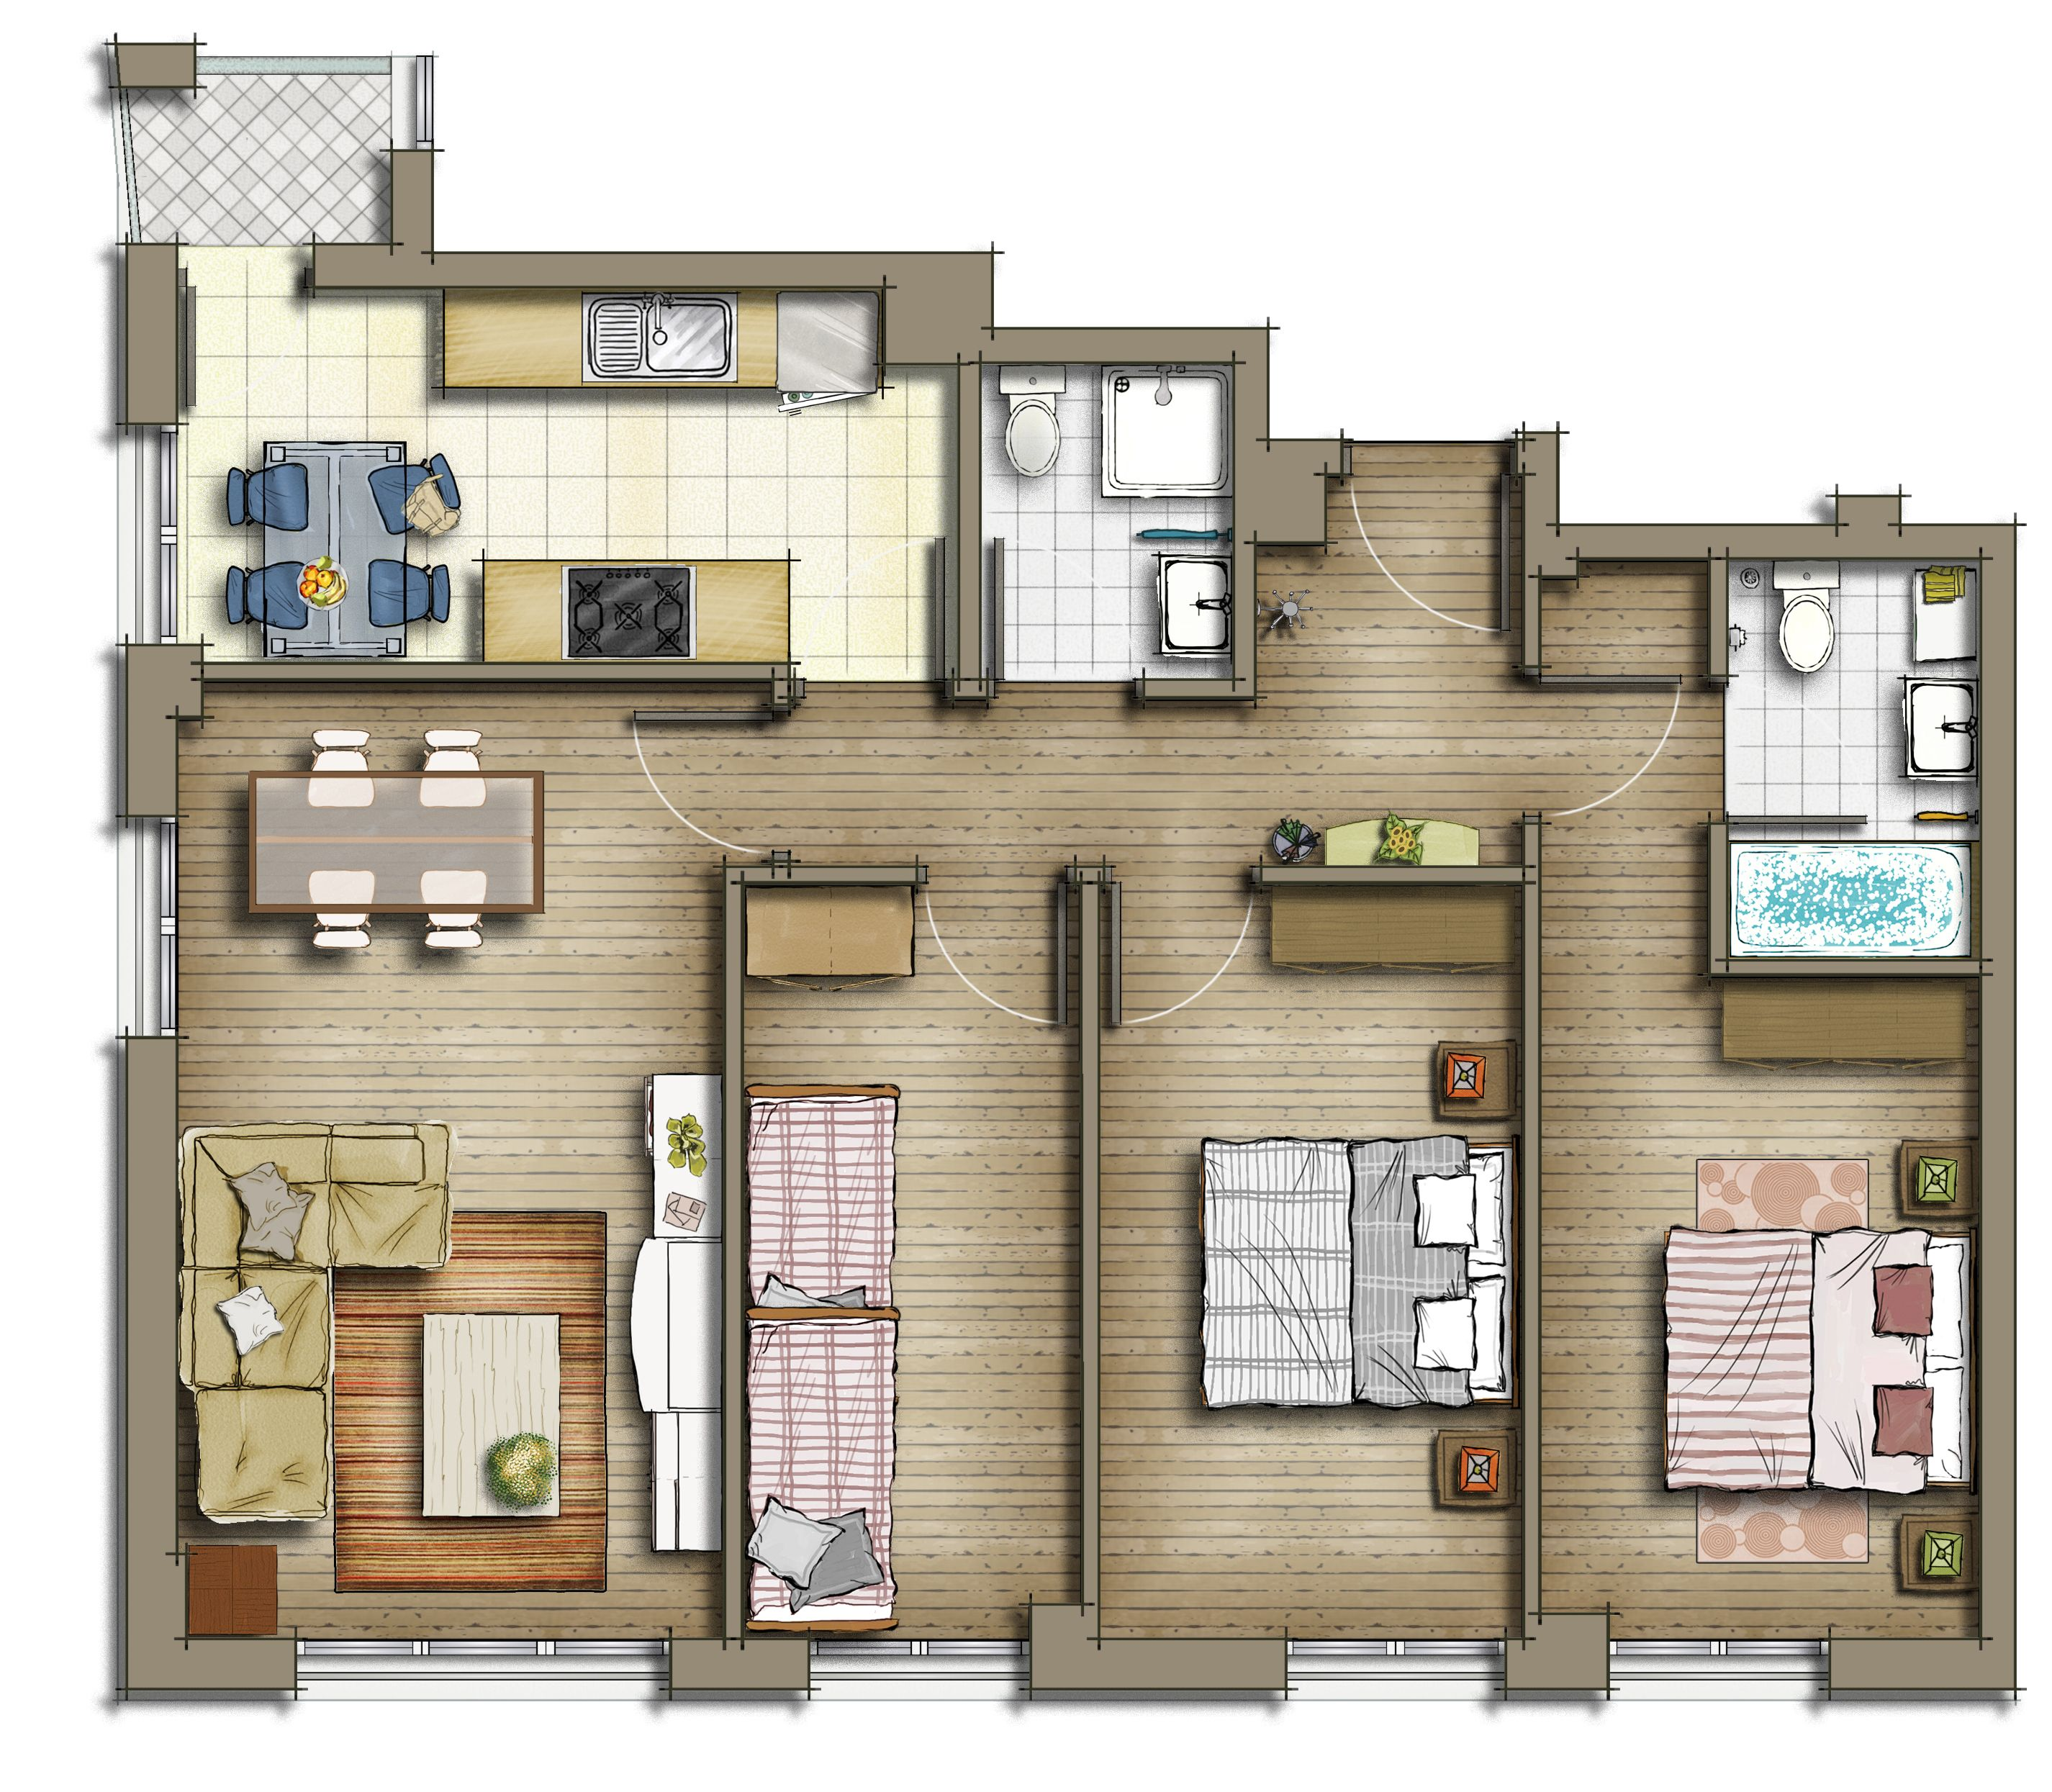 2D Residential Home Floor Plan_05 Interior design plan